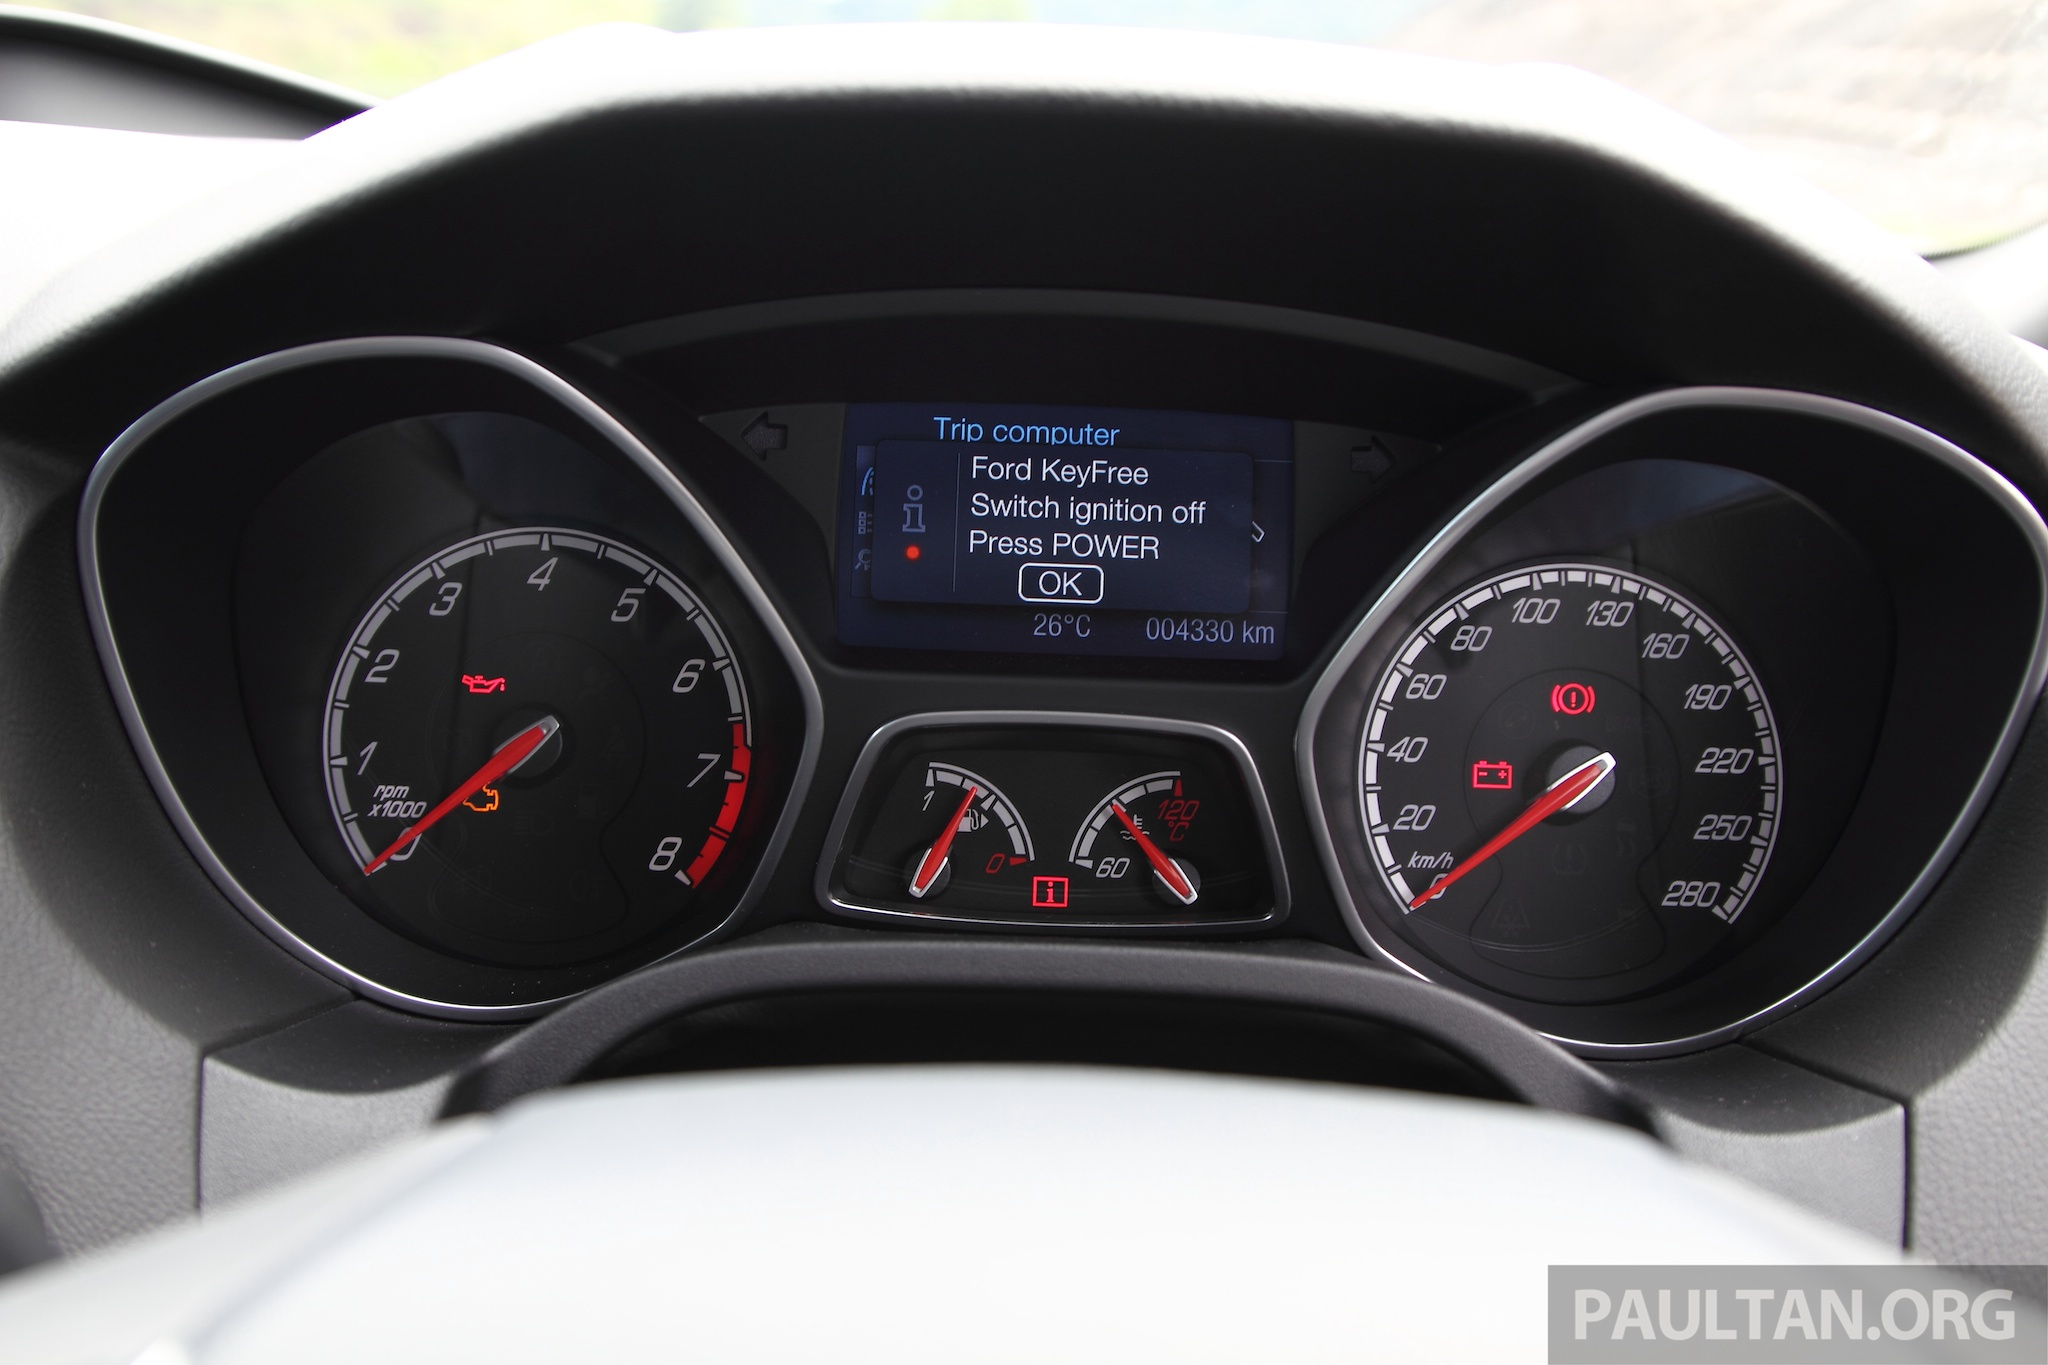 DRIVEN: Ford Focus ST vs Renault Megane RS 265 Image 224699